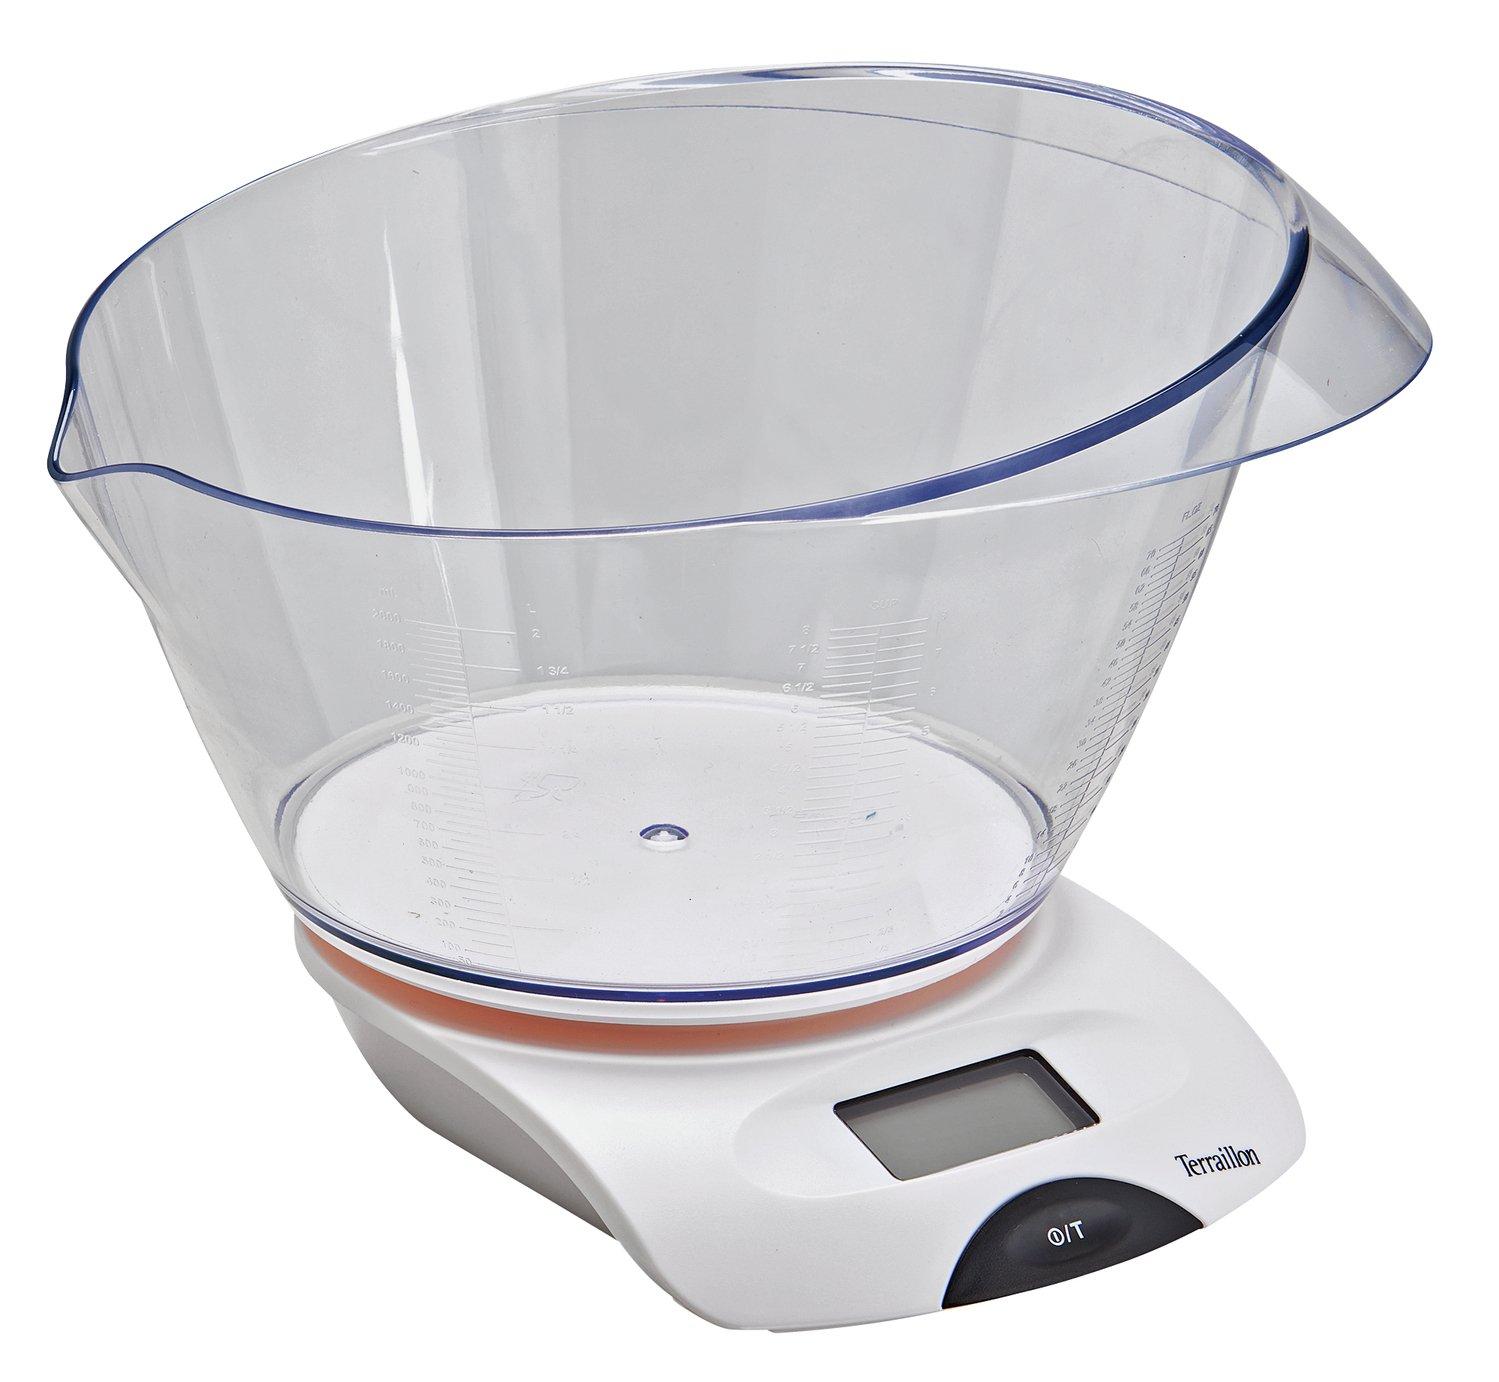 Terraillon Digital Scale with 2 Litre Bowl